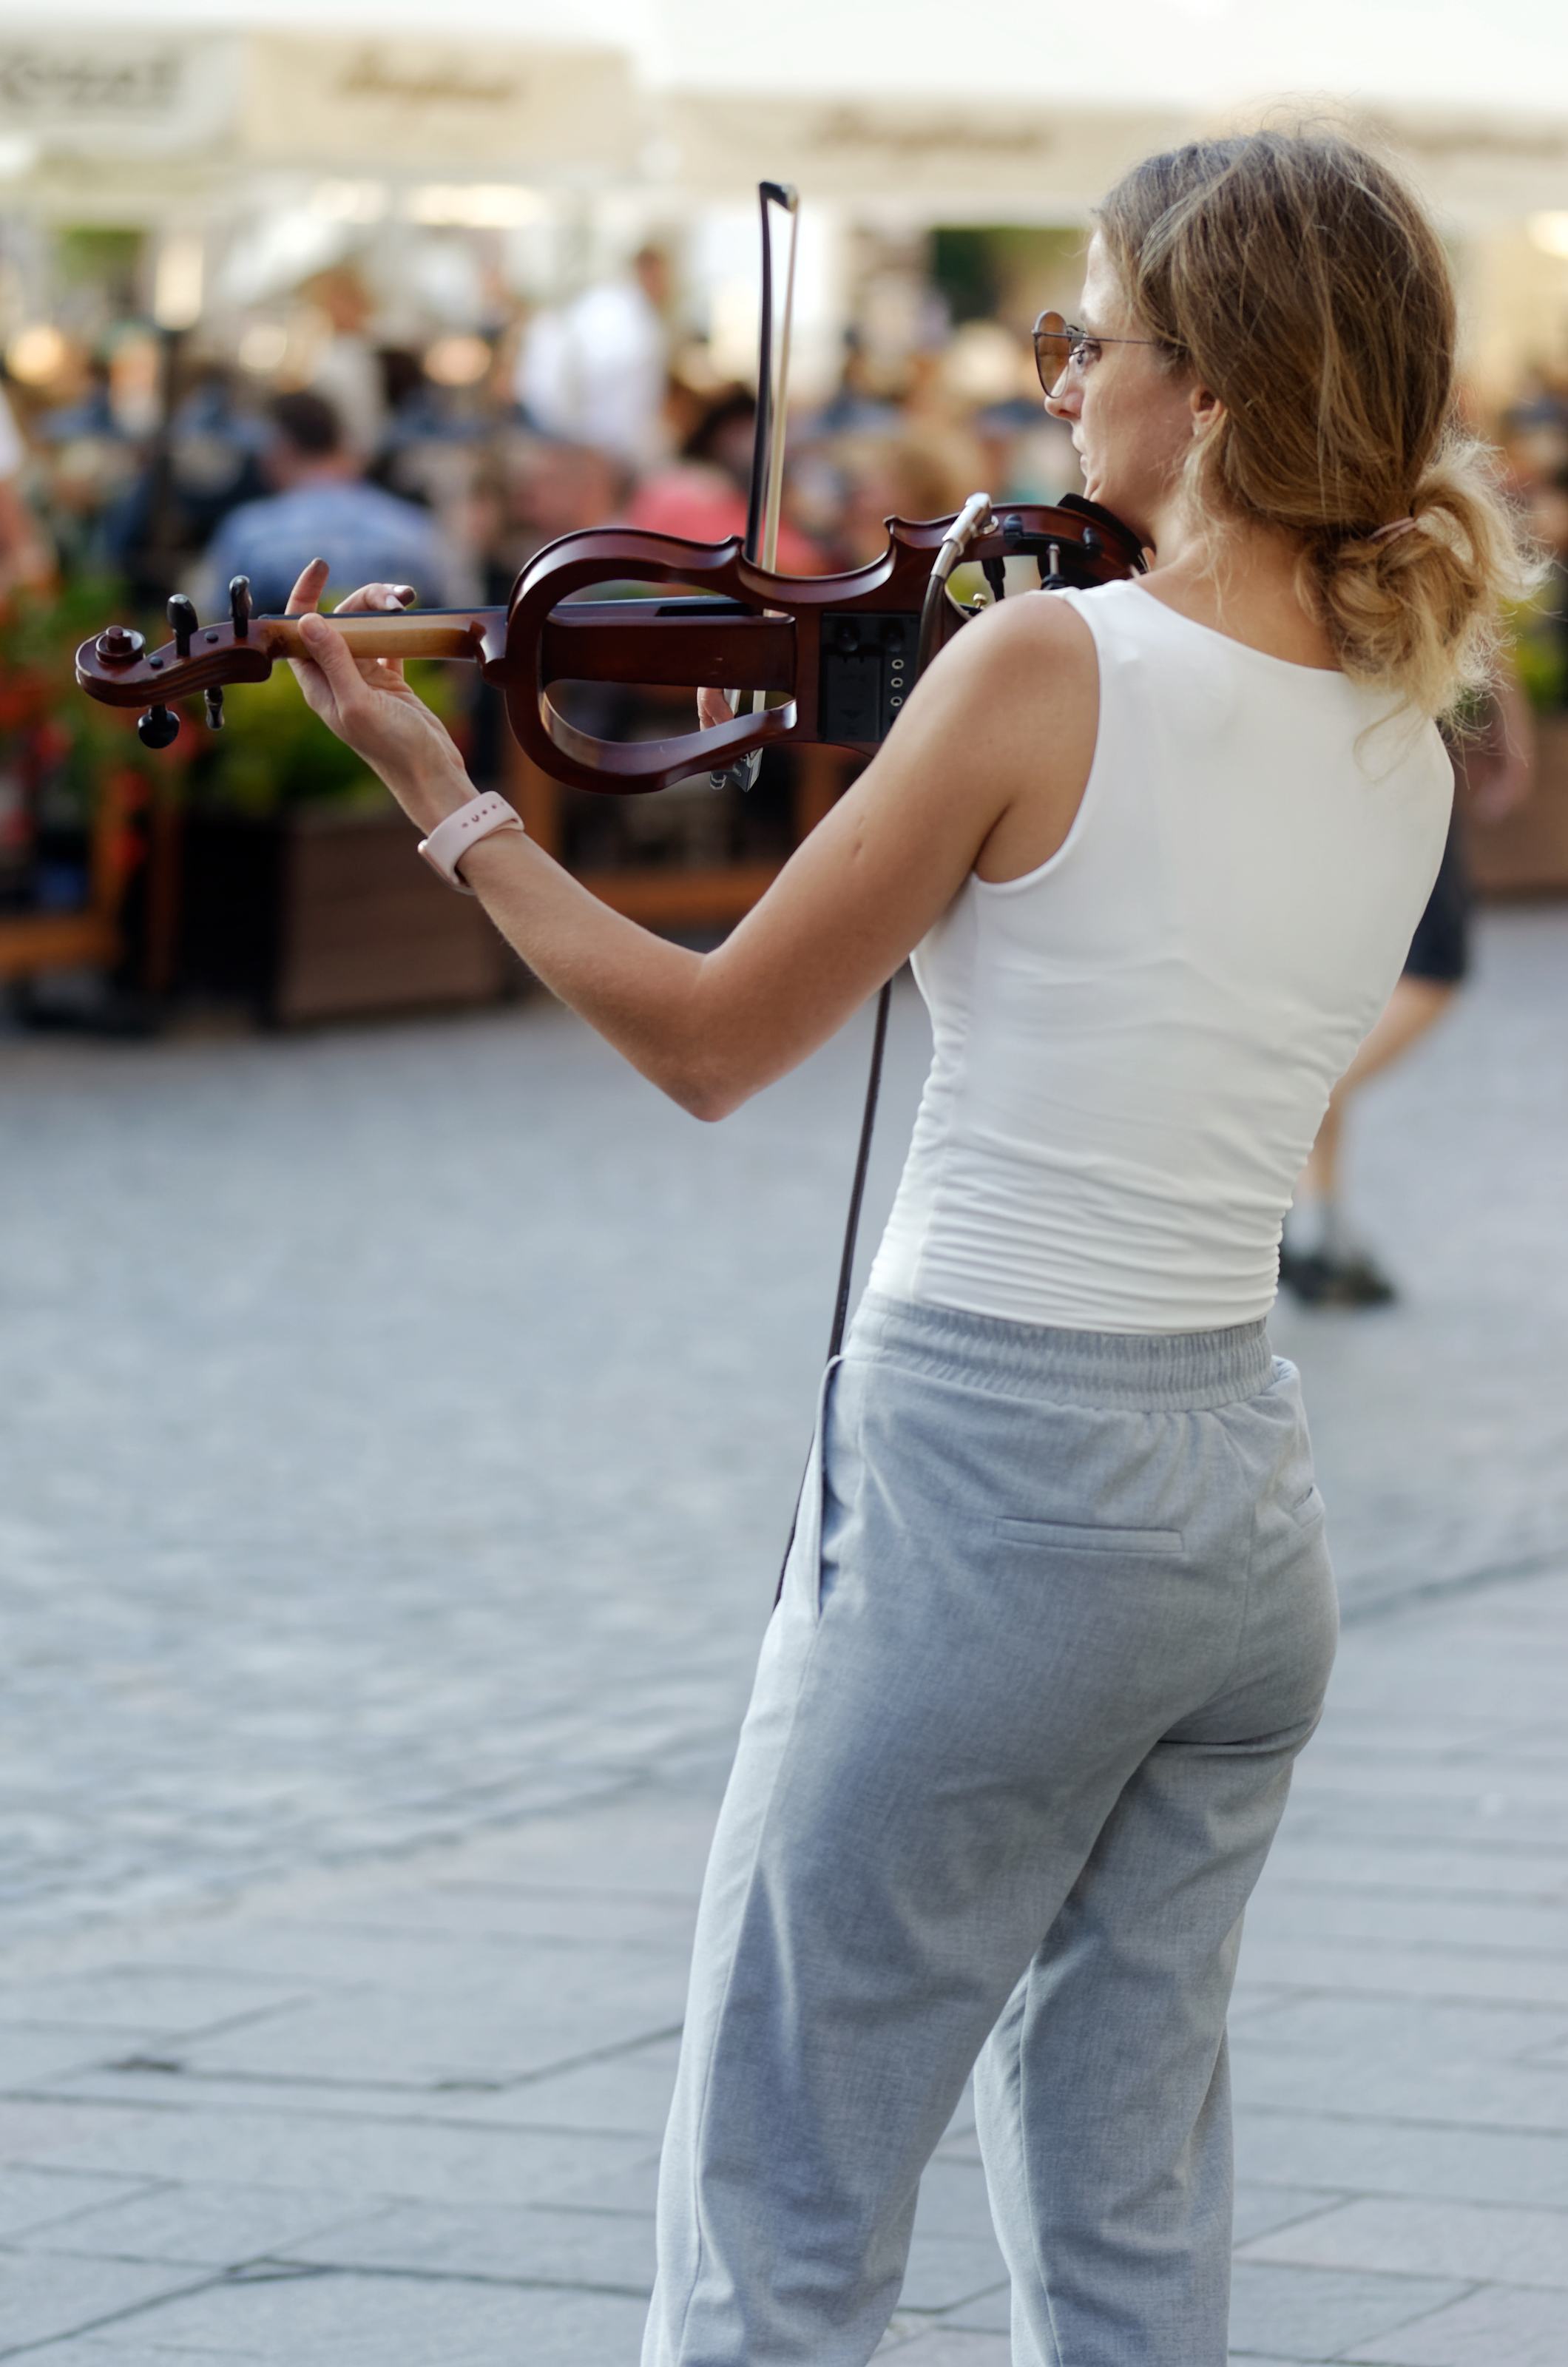 Woman Playing a Violin